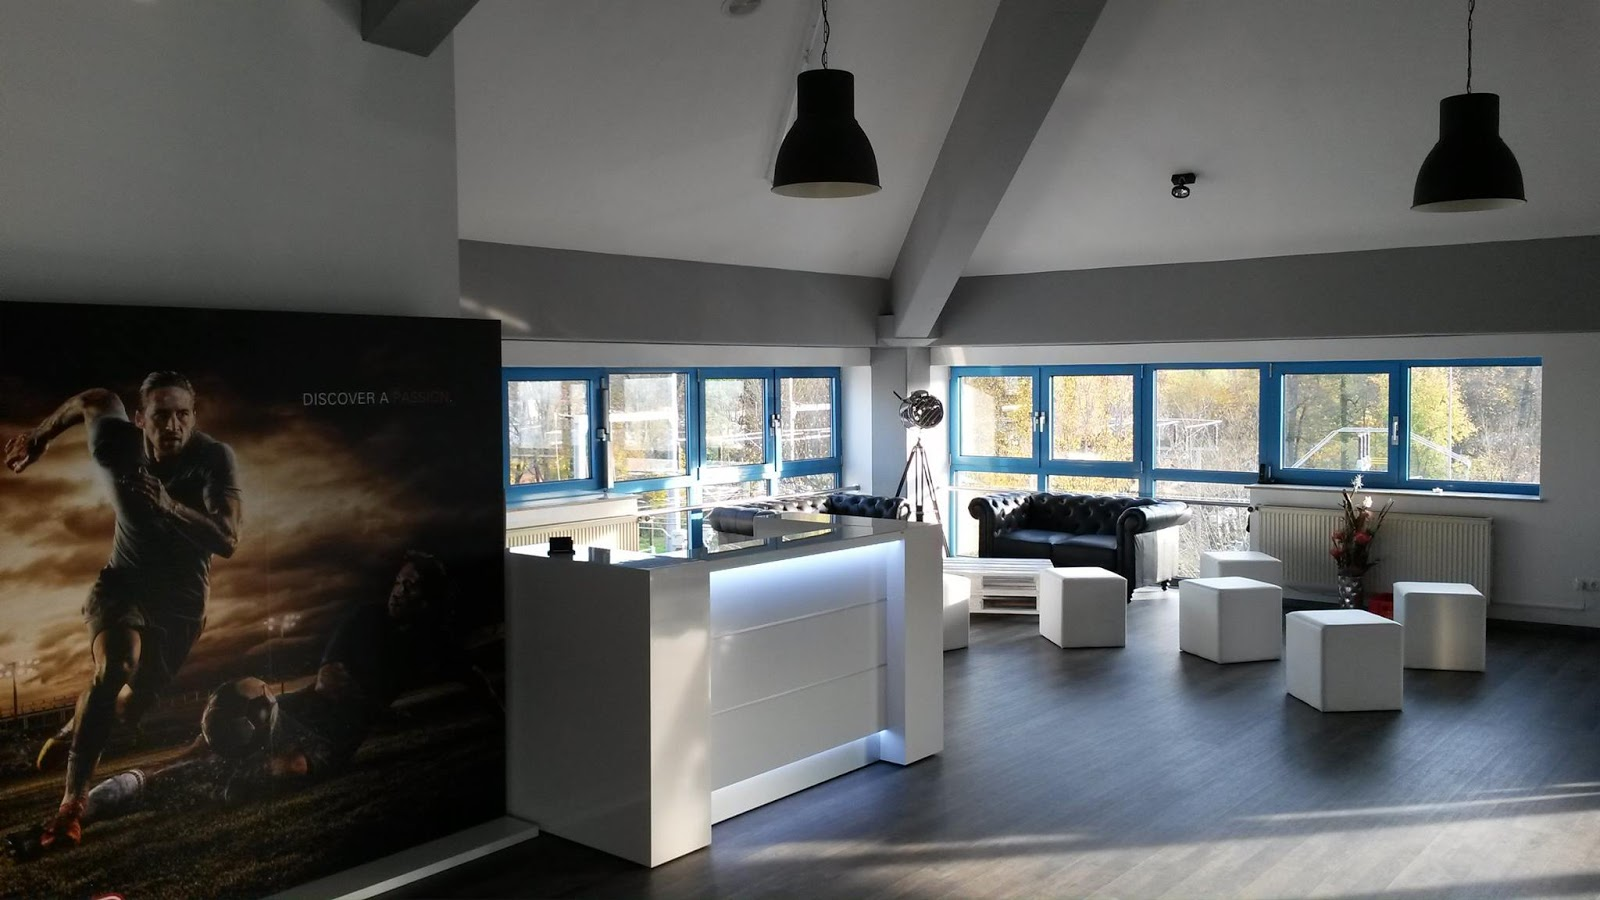 colour up your office moderen theken in hochglanzausf hrung f r ems studios in deutschland. Black Bedroom Furniture Sets. Home Design Ideas